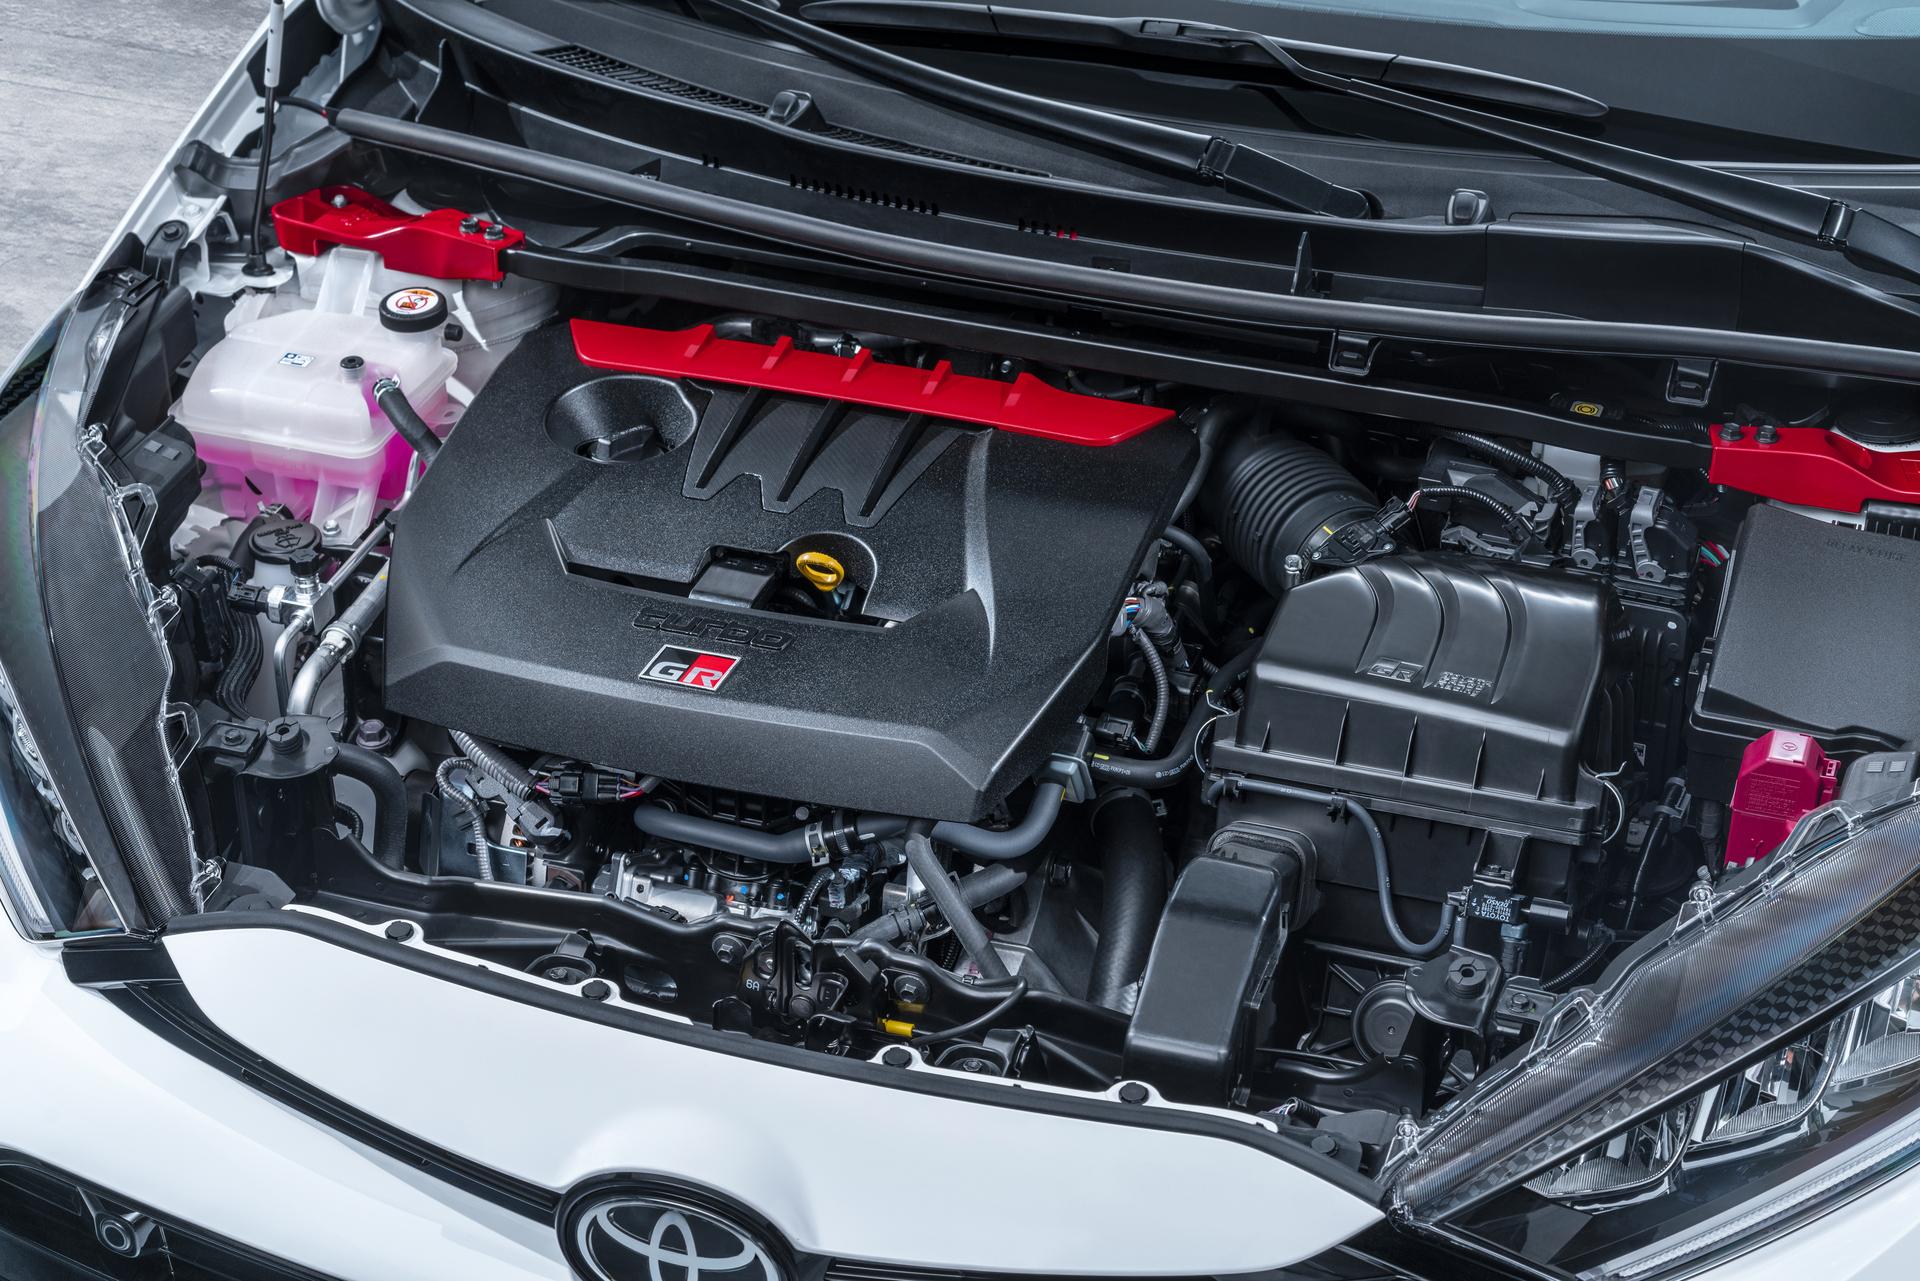 Toyotagryaris9